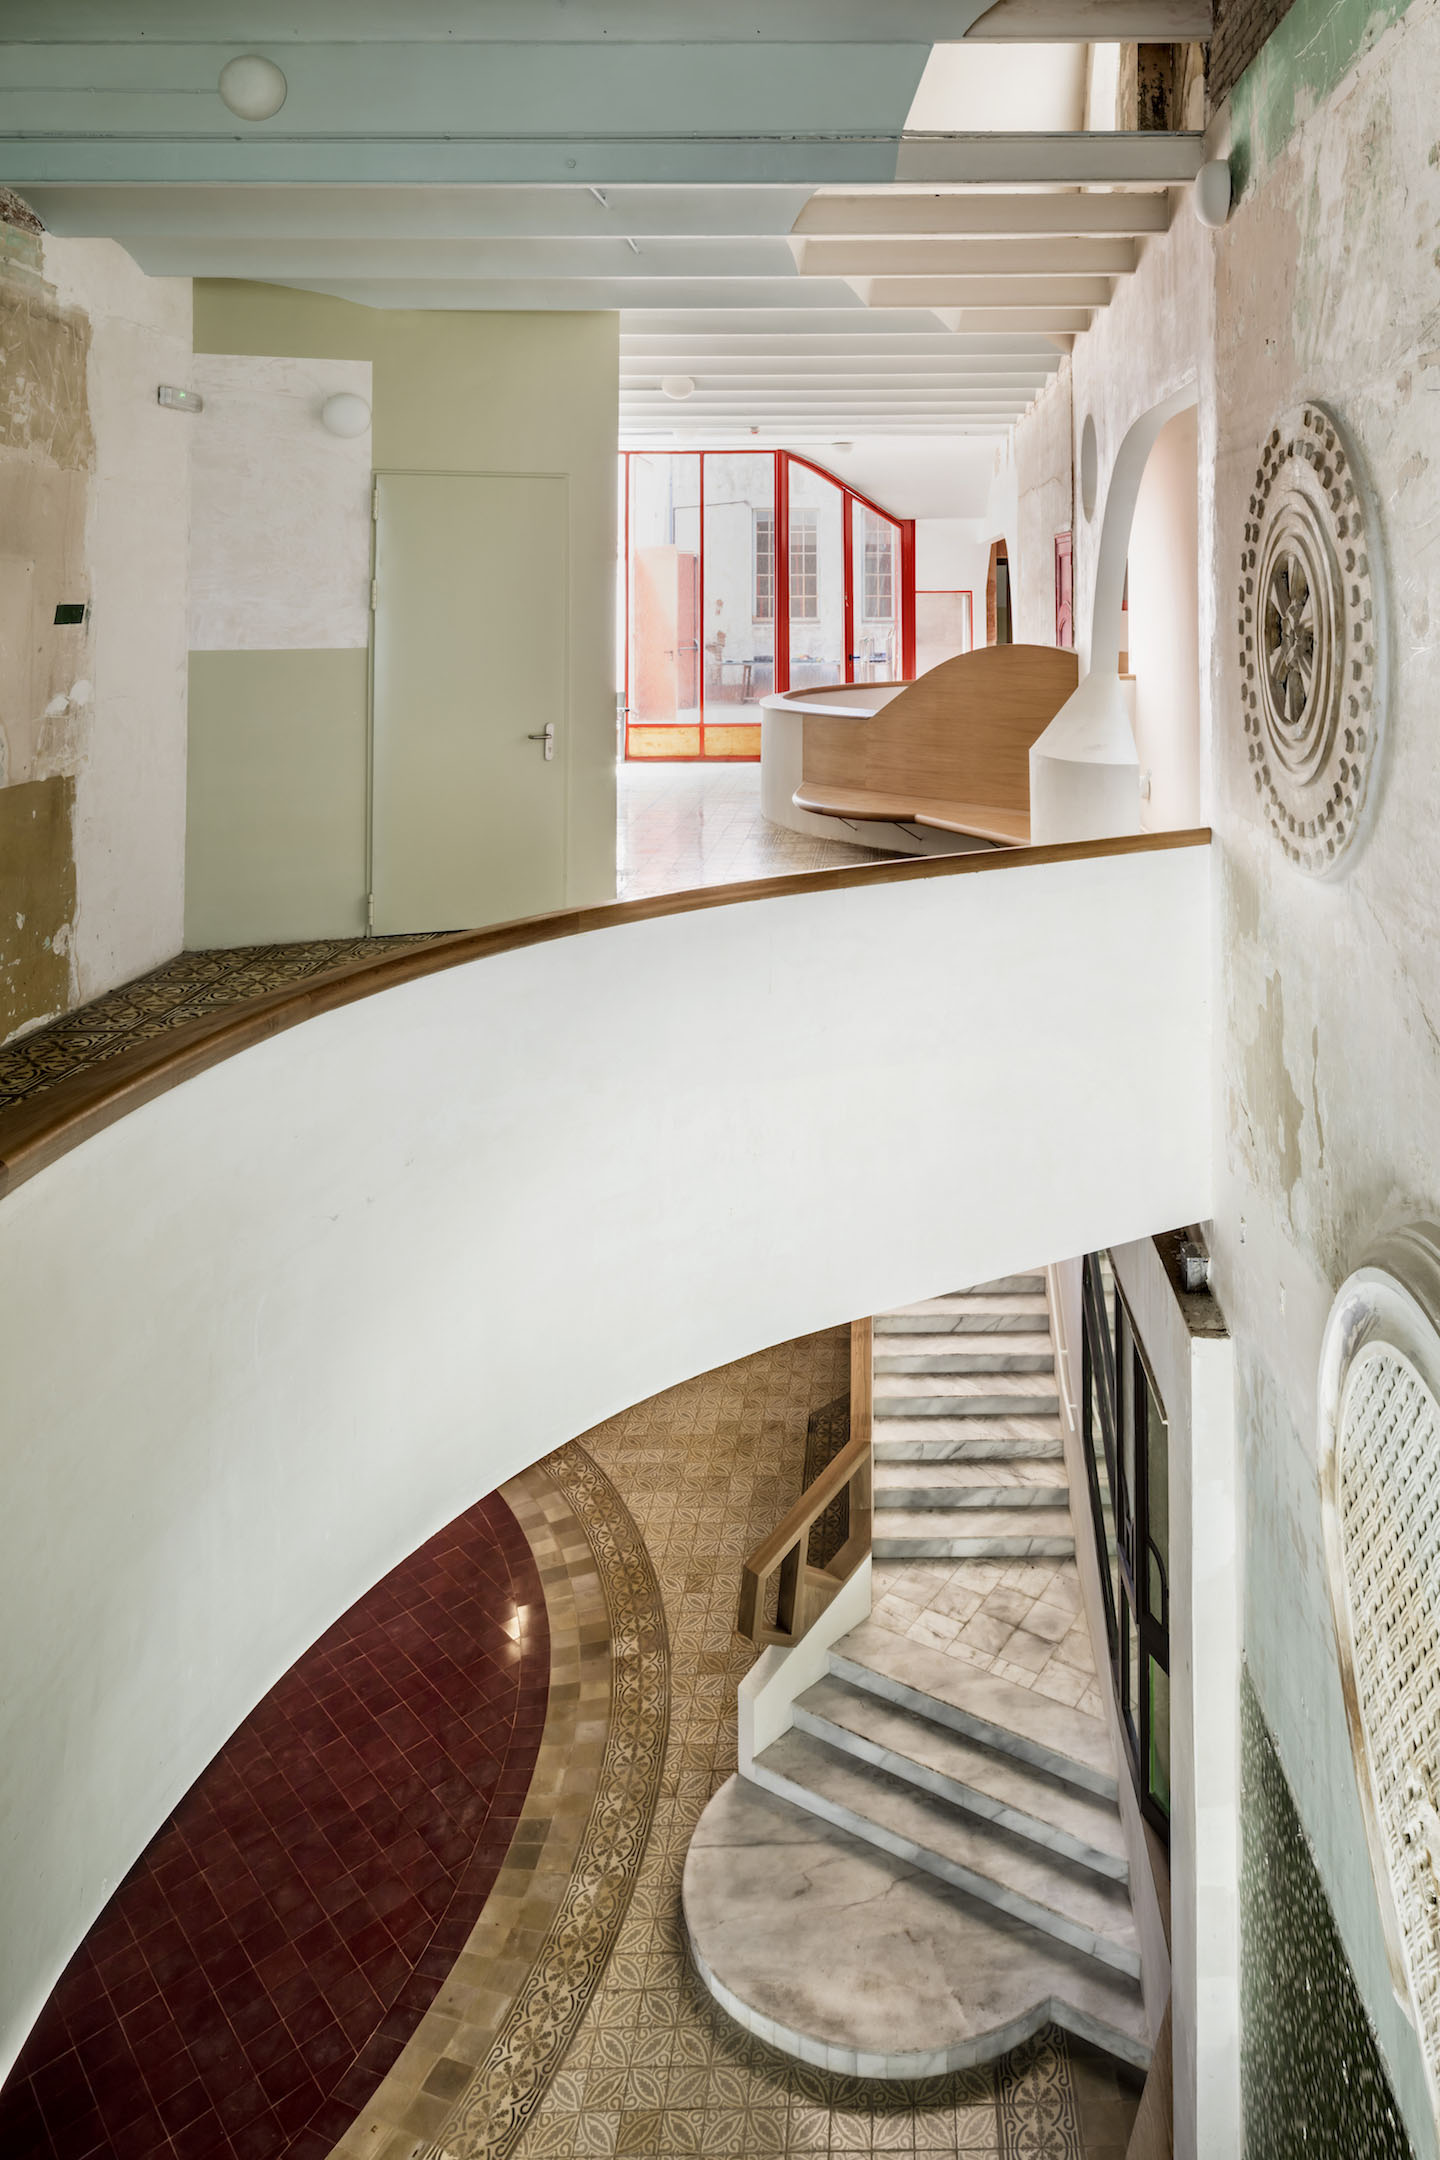 FLORES PRAT ARCHITECTS SALA BECKETT